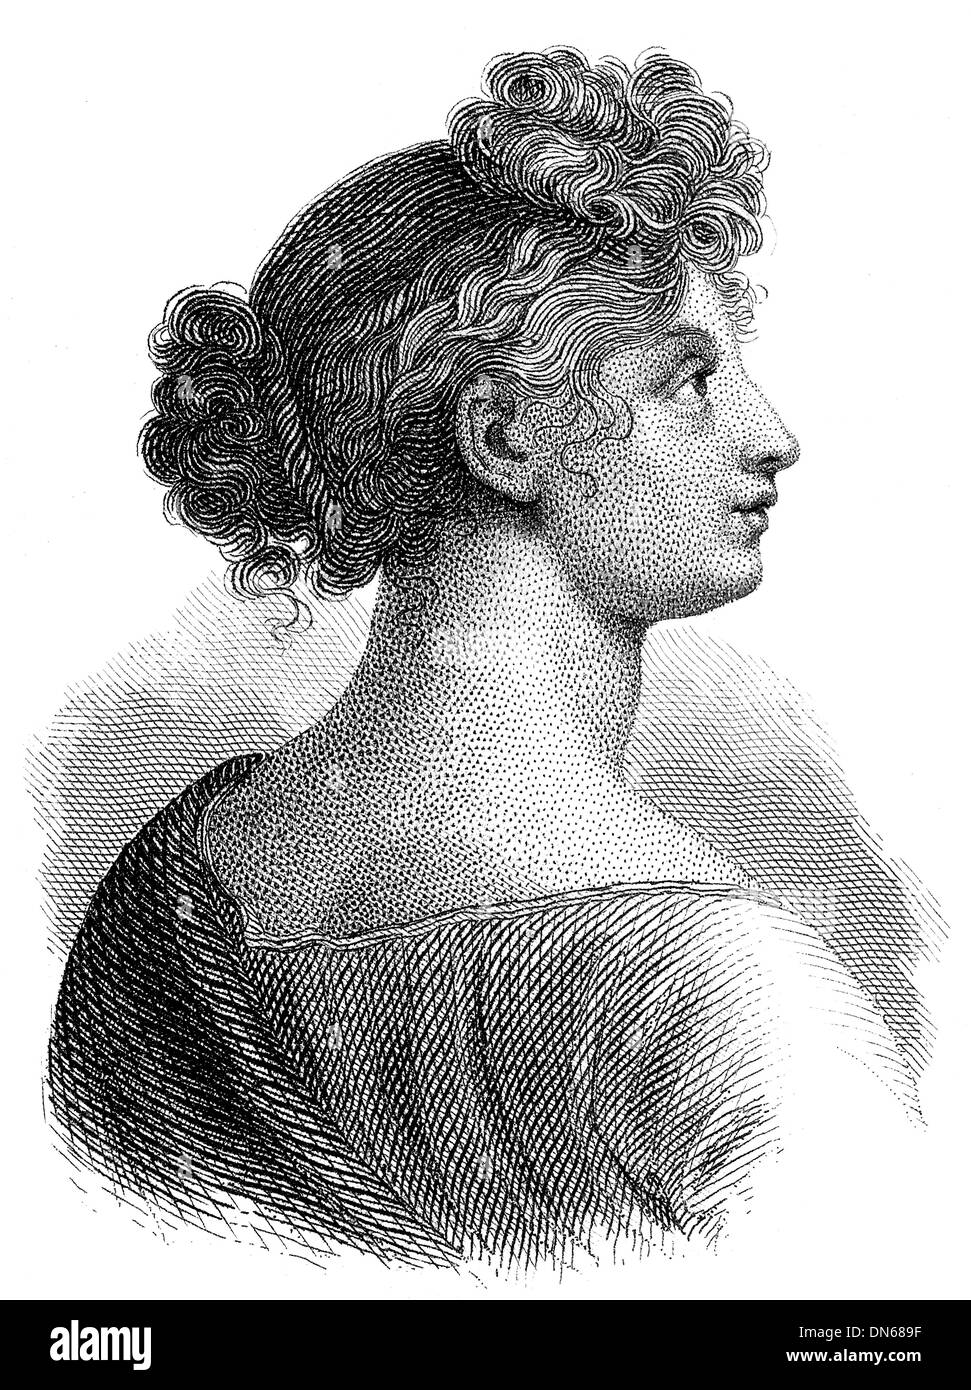 Louise of Mecklenburg-Strelitz, 1776–1810, queen consort of Prussia, - Stock Image